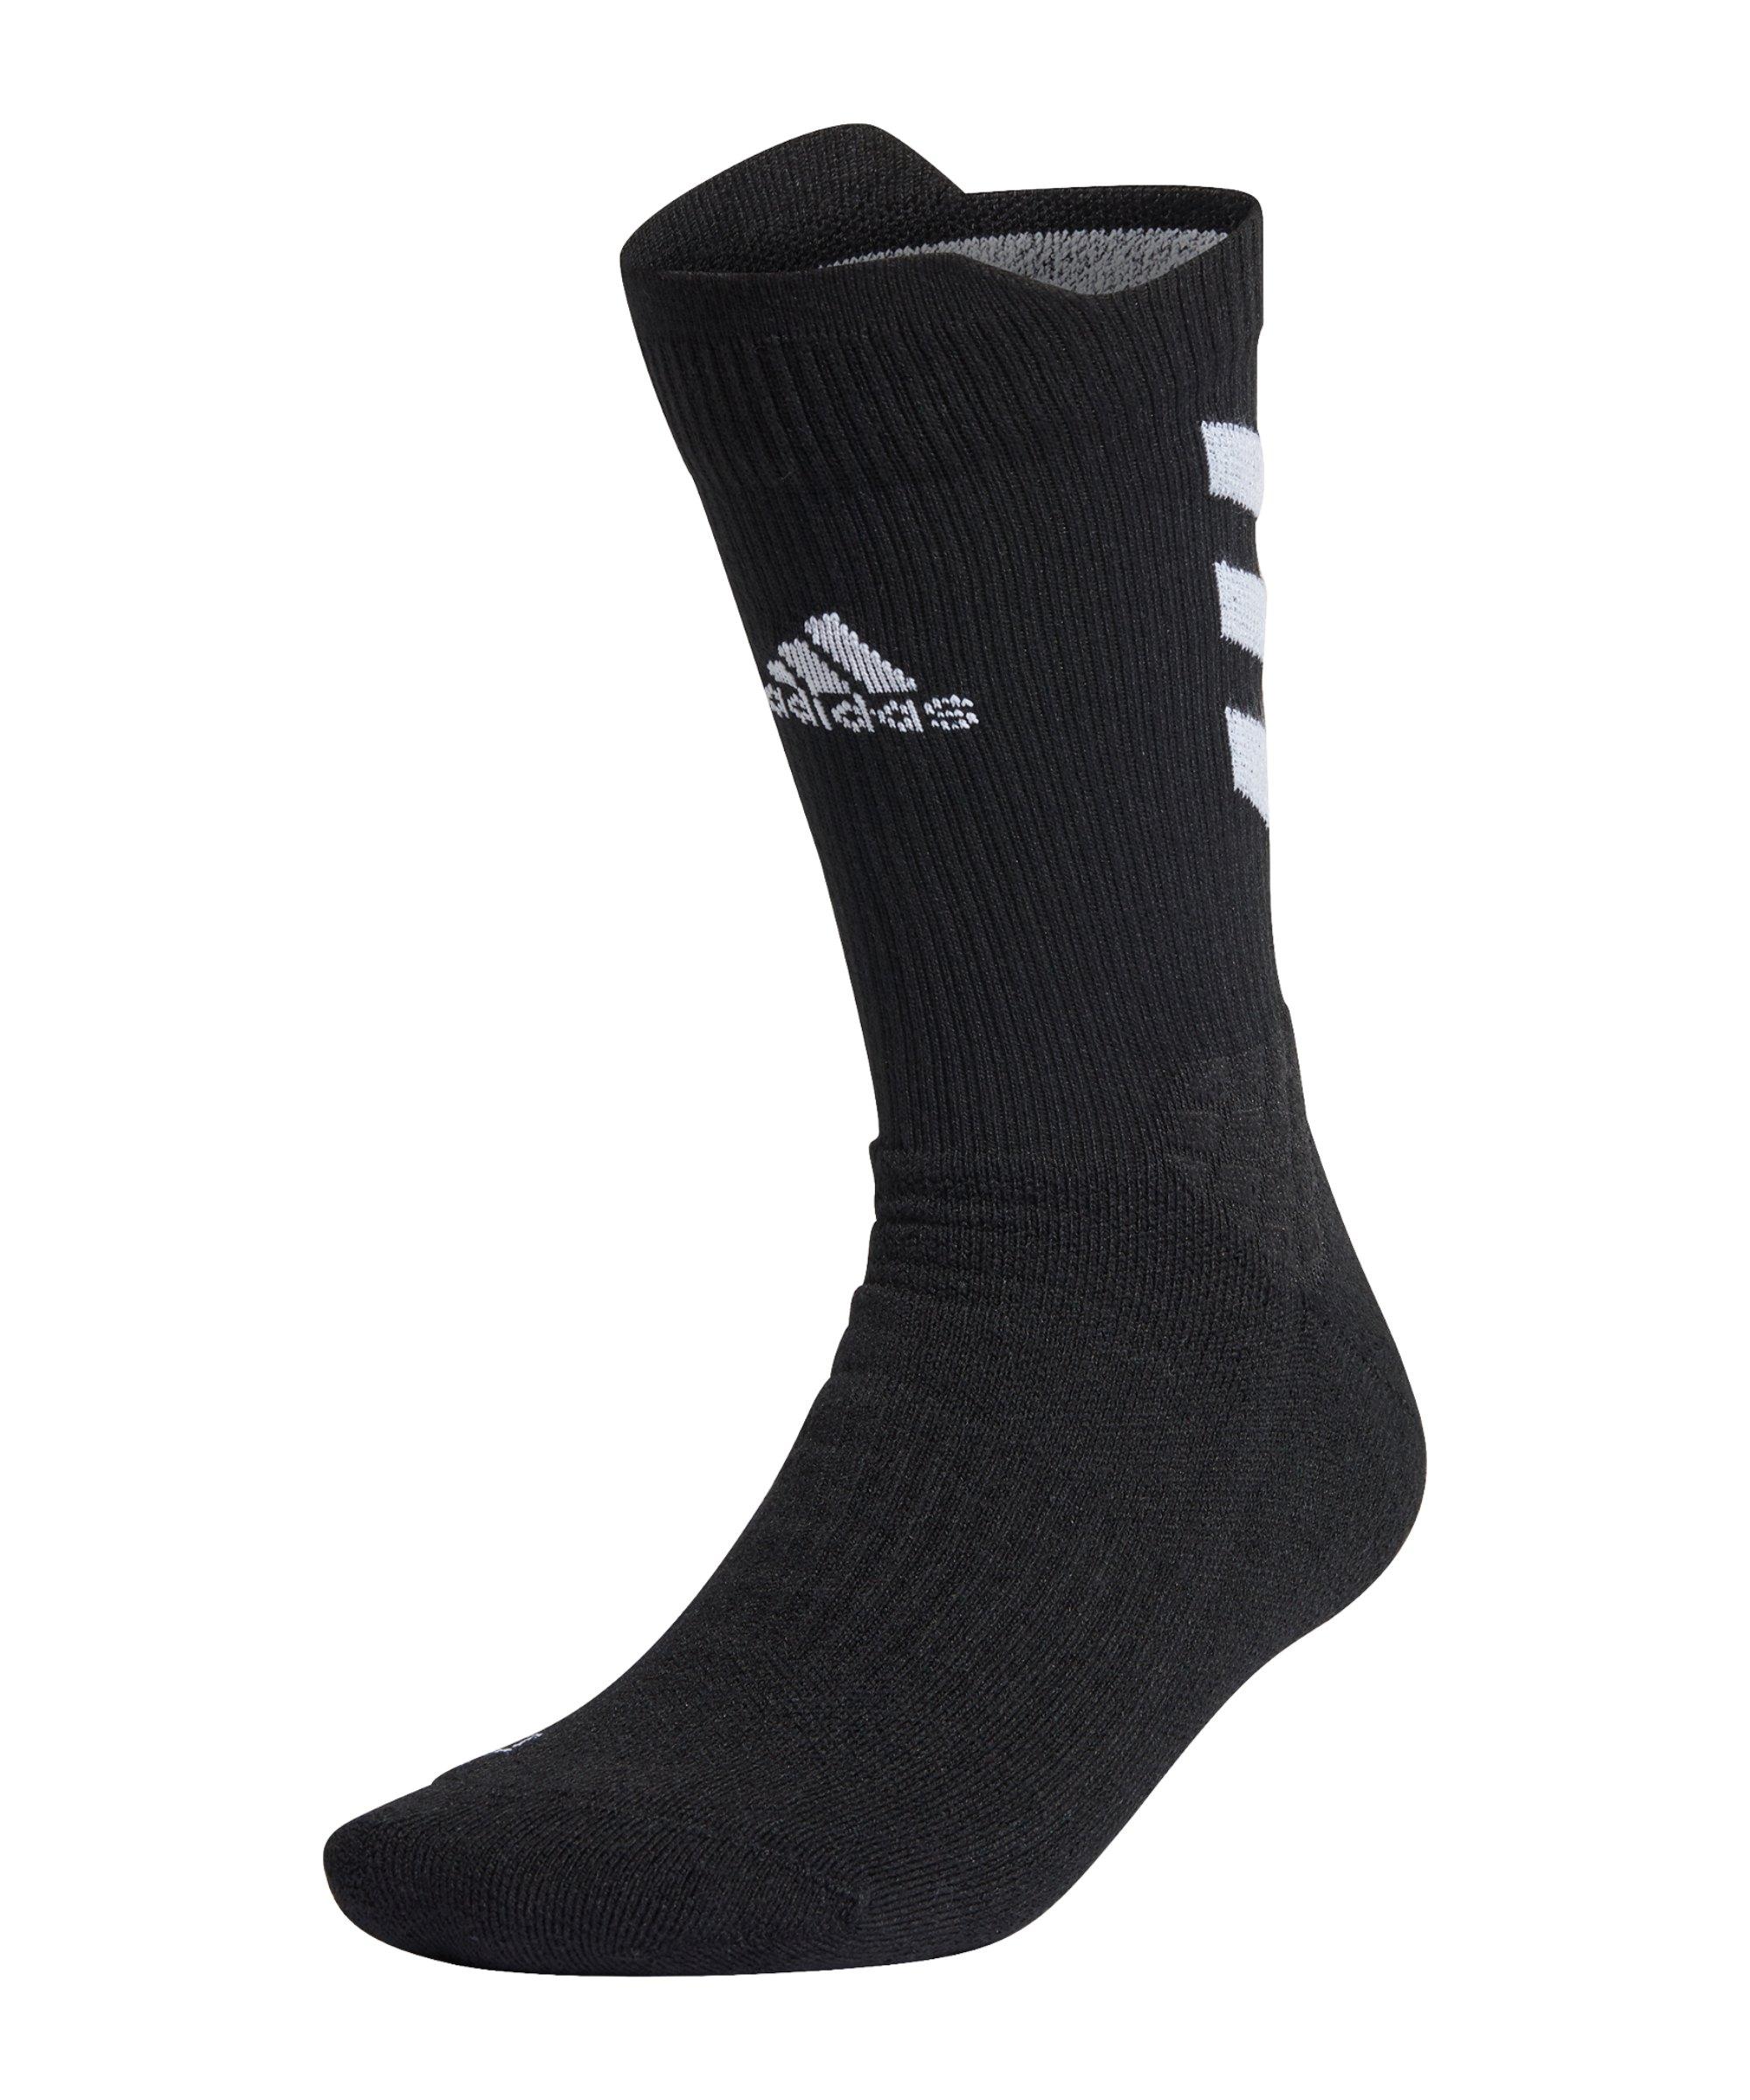 adidas Alphaskin Crew MC Socken Schwarz - schwarz